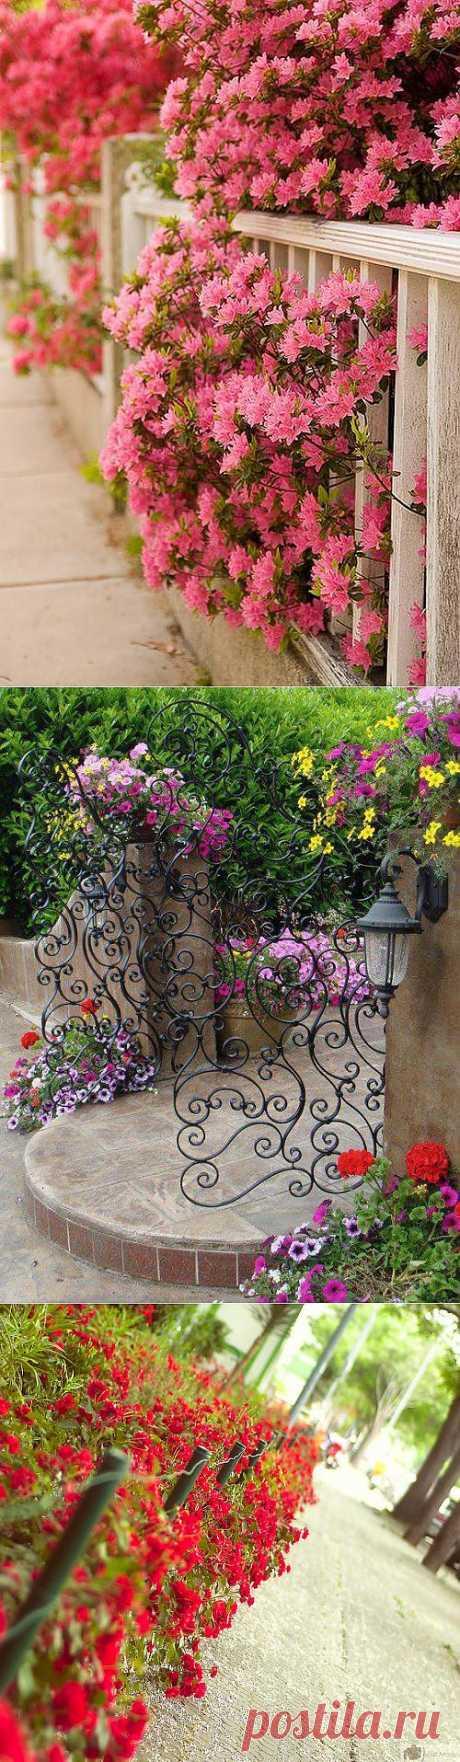 Неописуемая красота: креатифф-подход к заборам и калиткам на садовом участке.